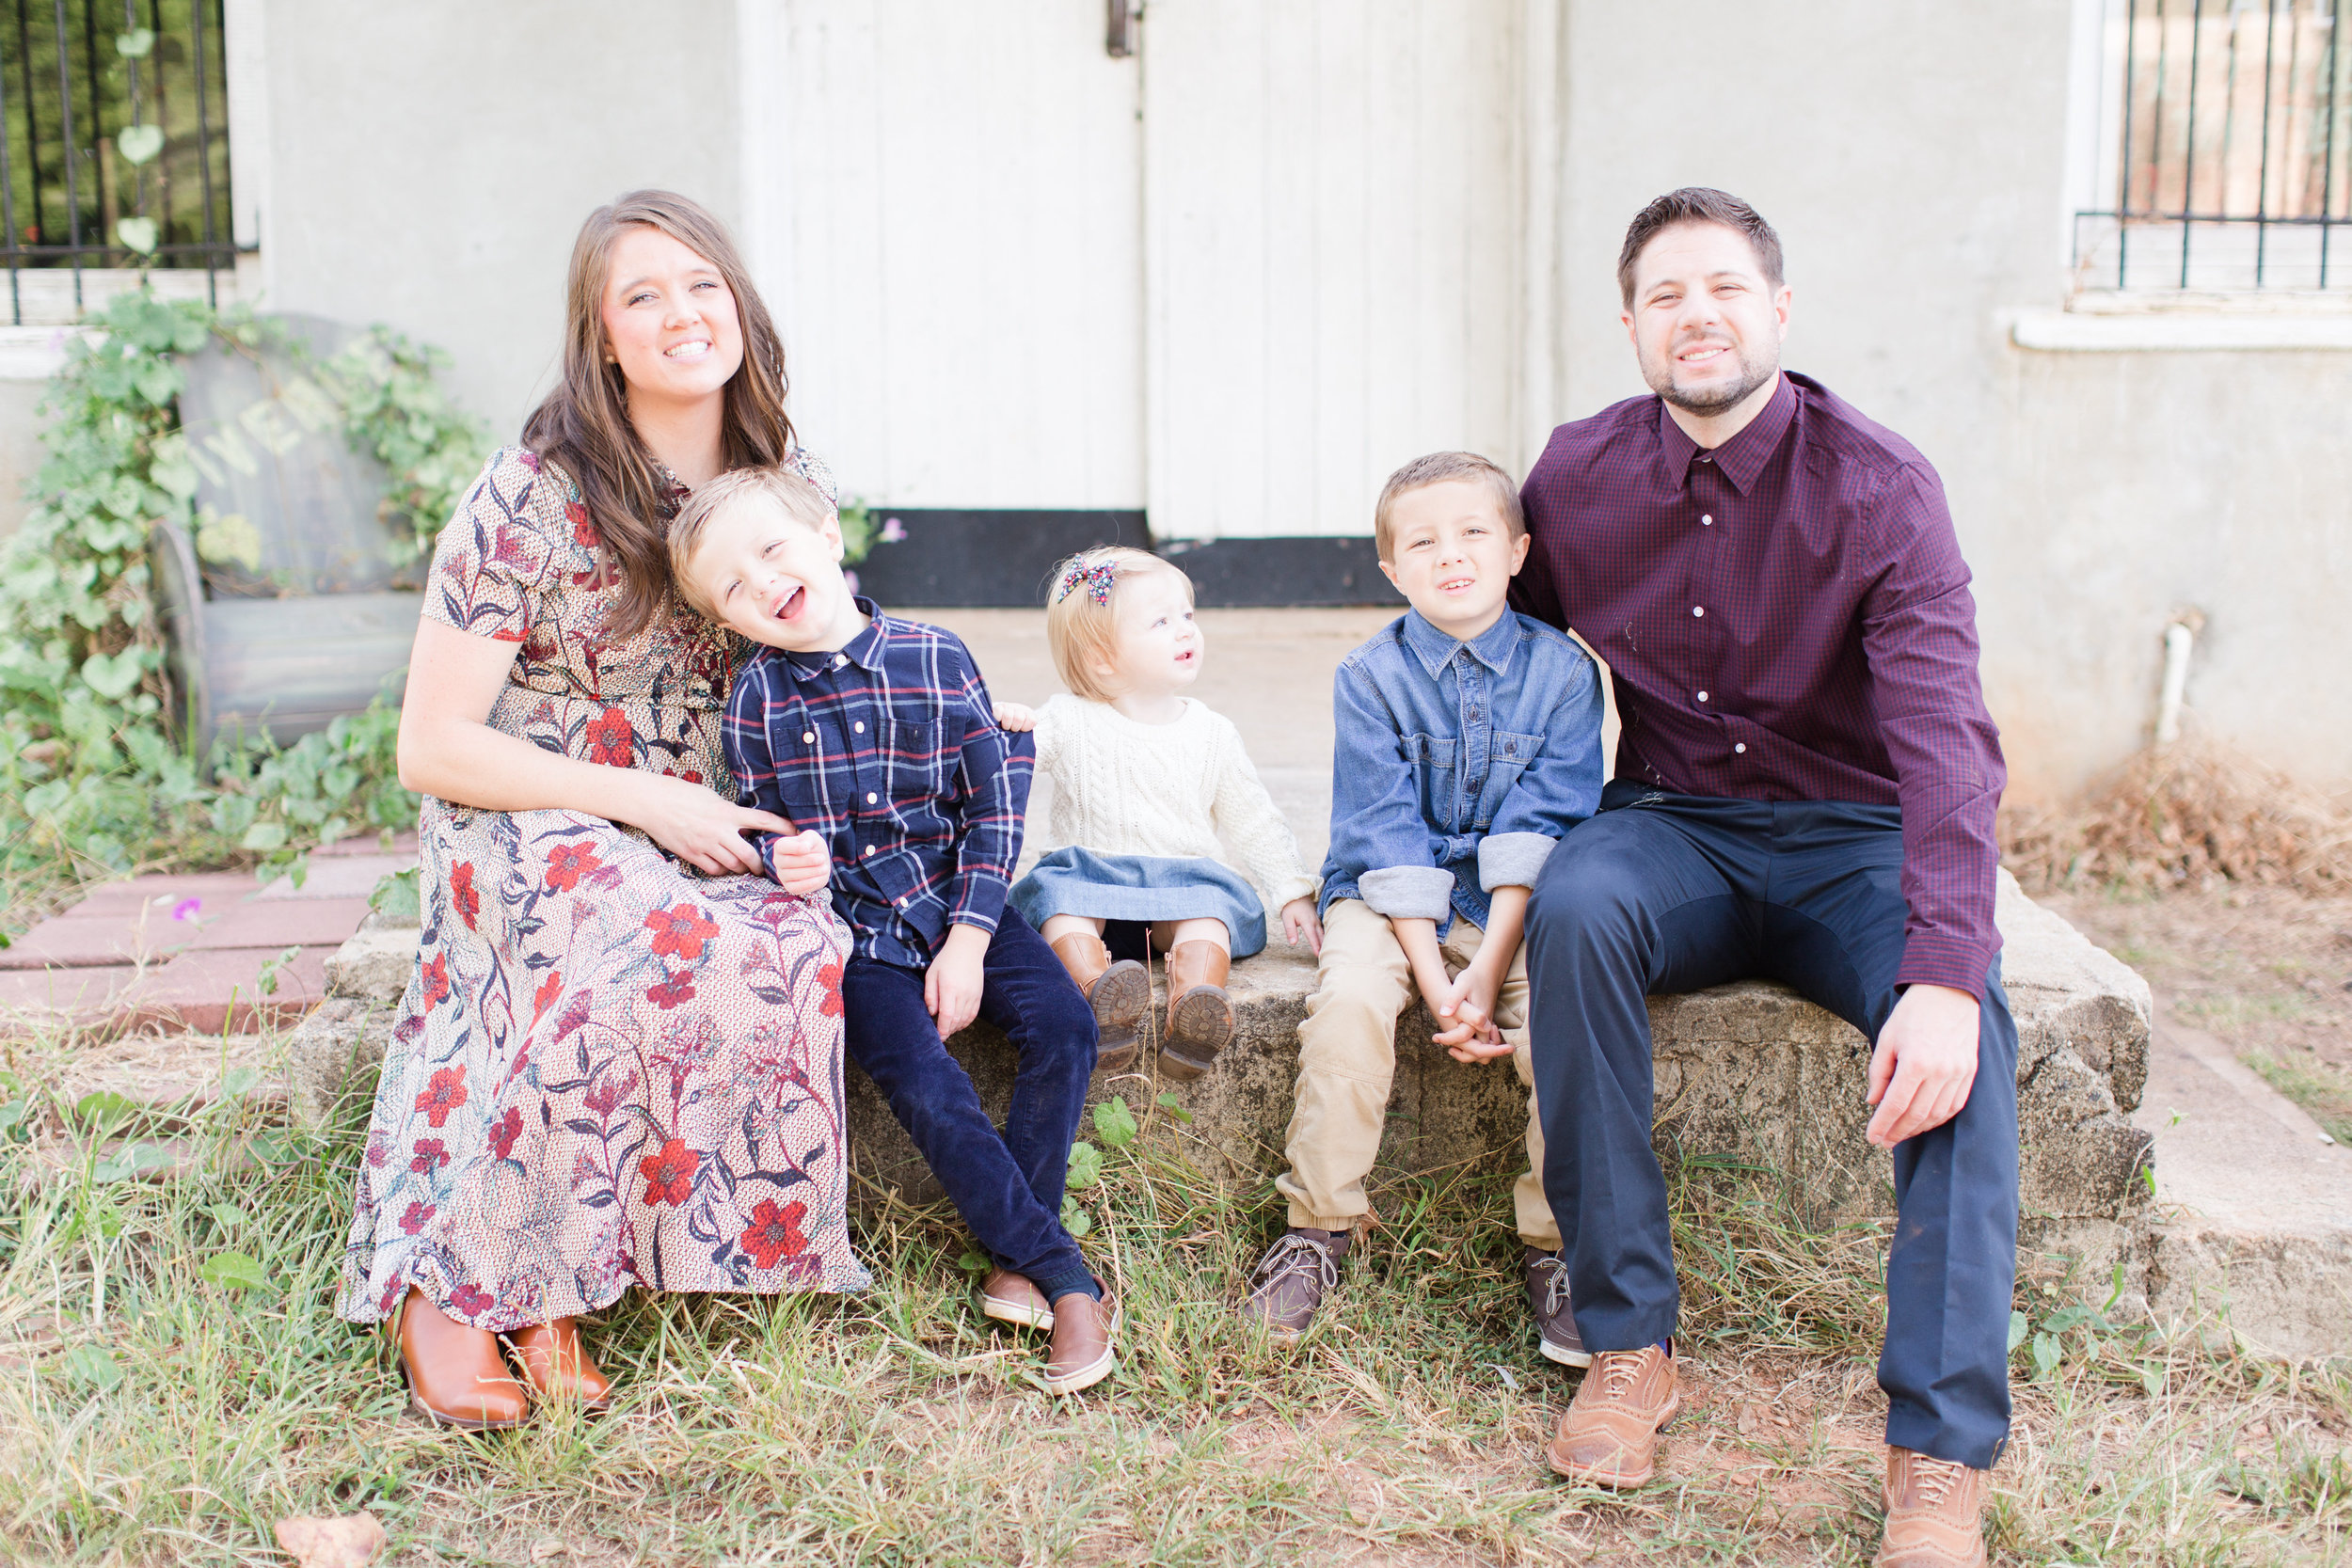 The Day Family-Day Family-0206.jpg